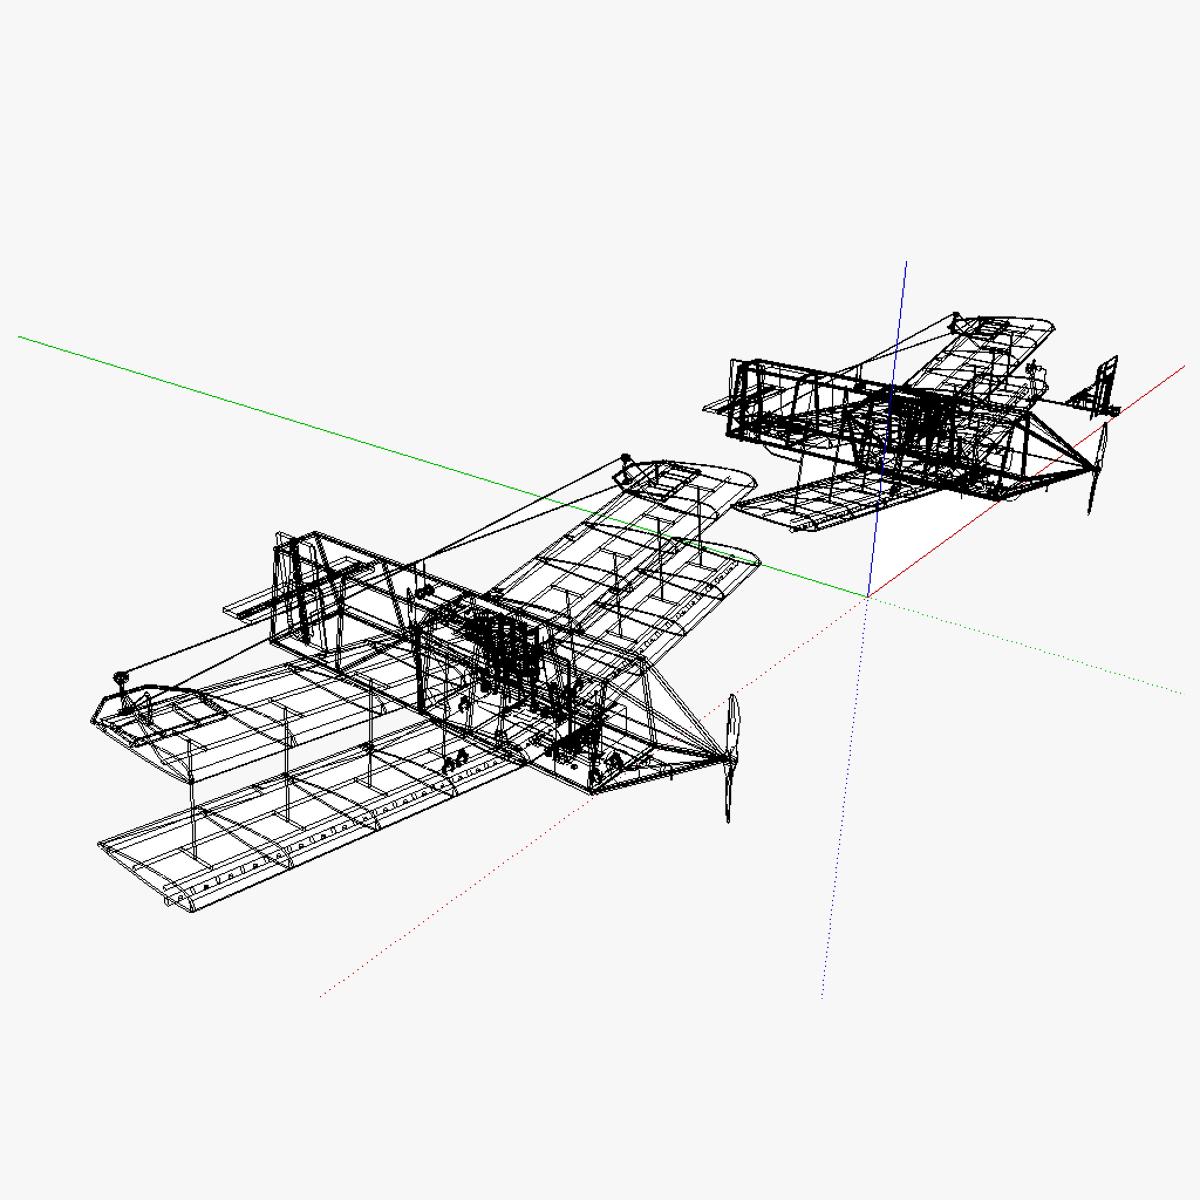 At Uas Unmanned Aerial System 3d Model Skp